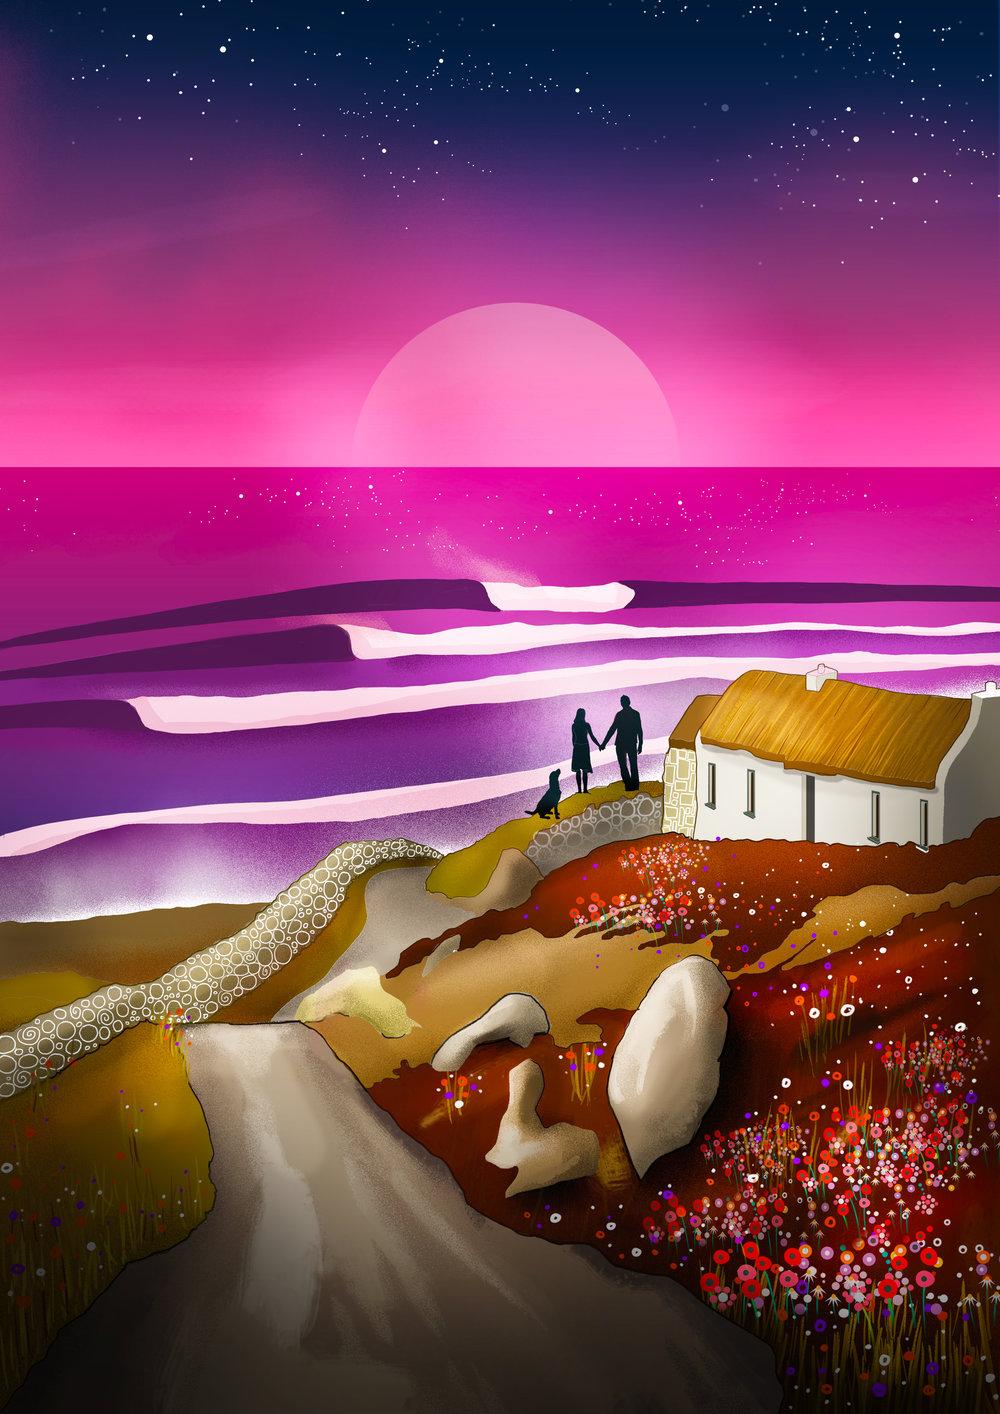 Reddin Designs our future wedding illustration